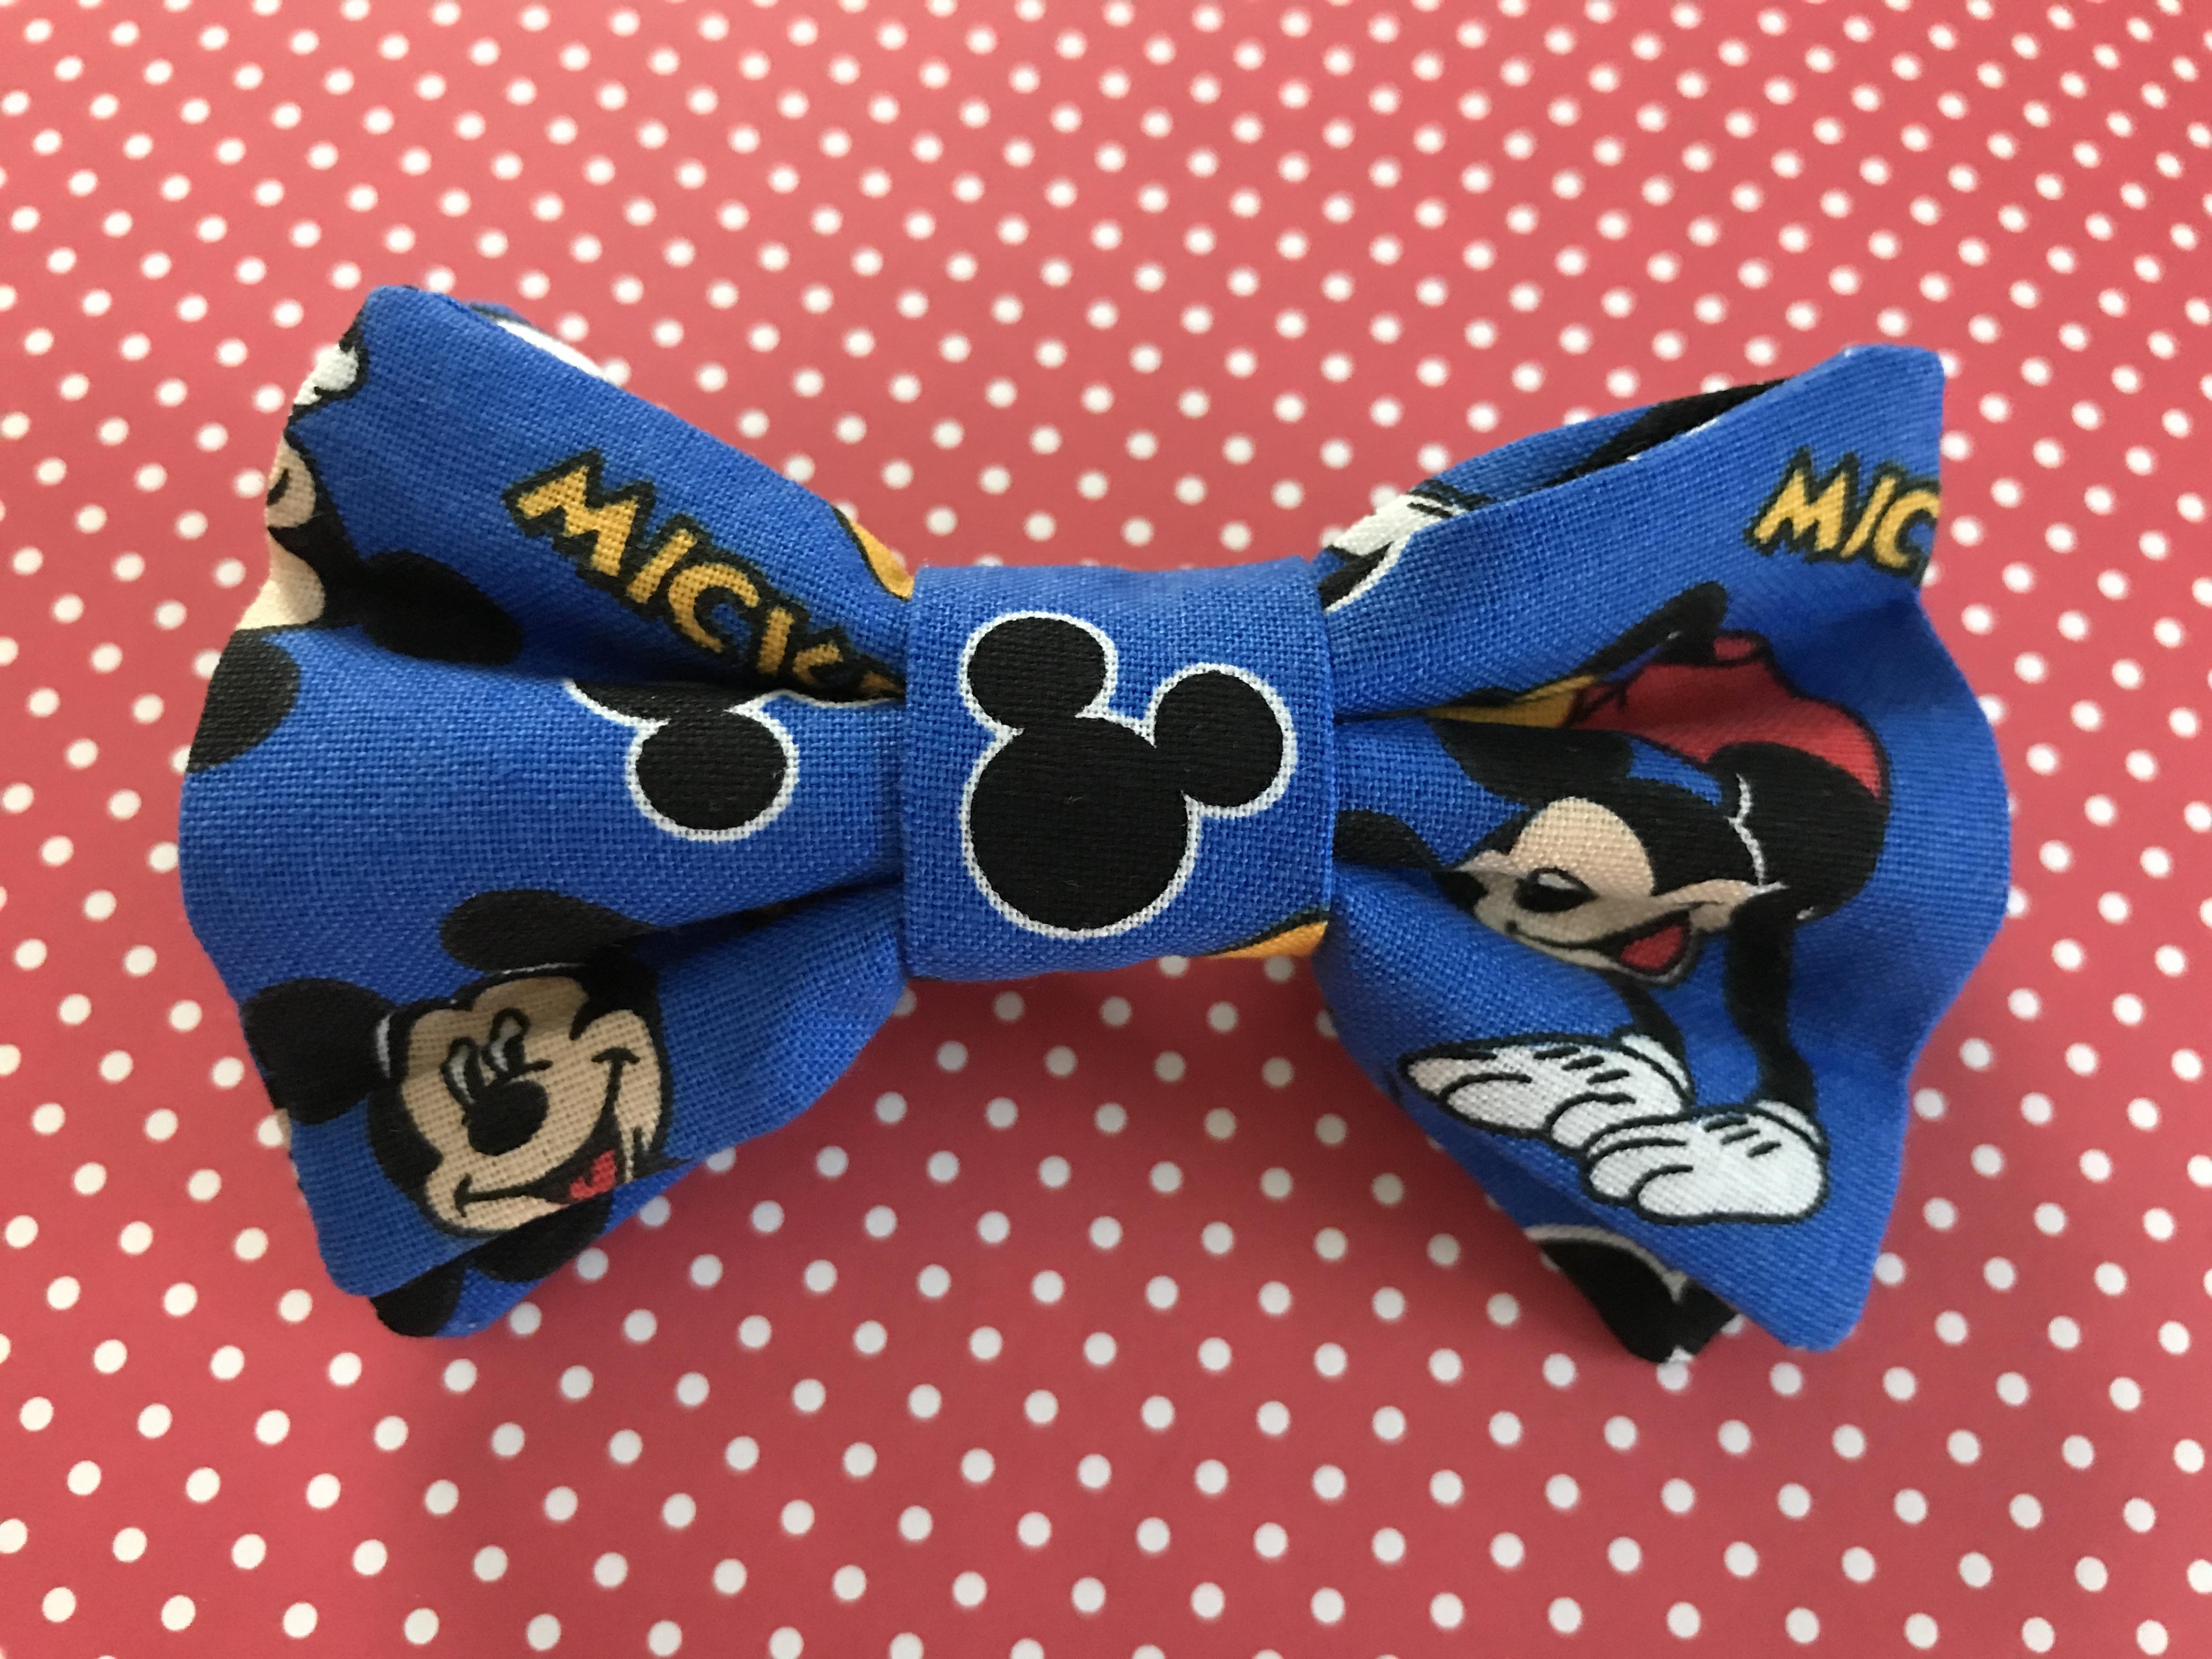 Little Mickey